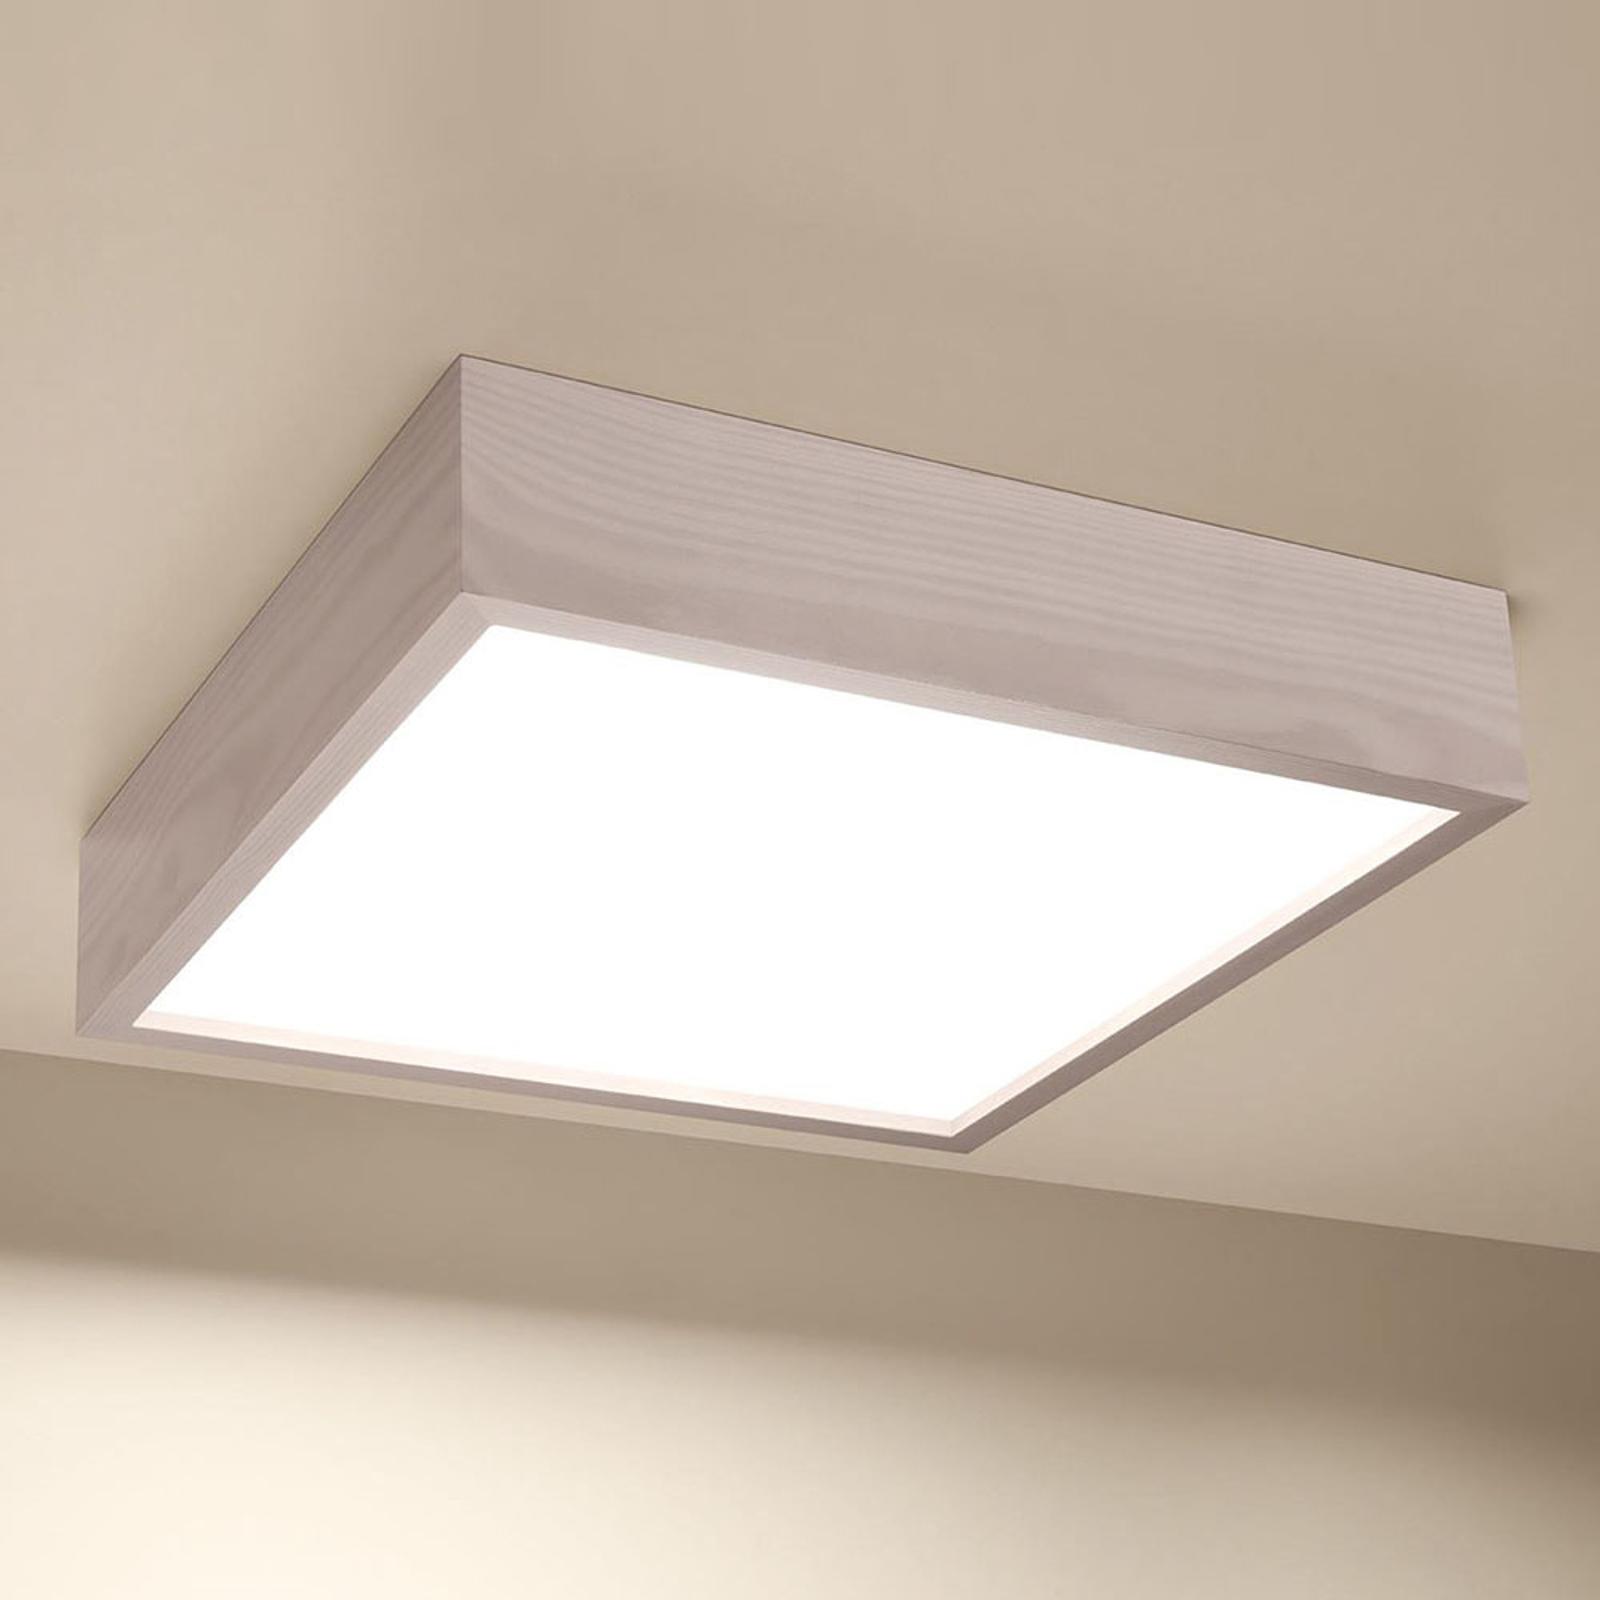 Madras taklampe eik Sonoma 38,5x38,5 cm